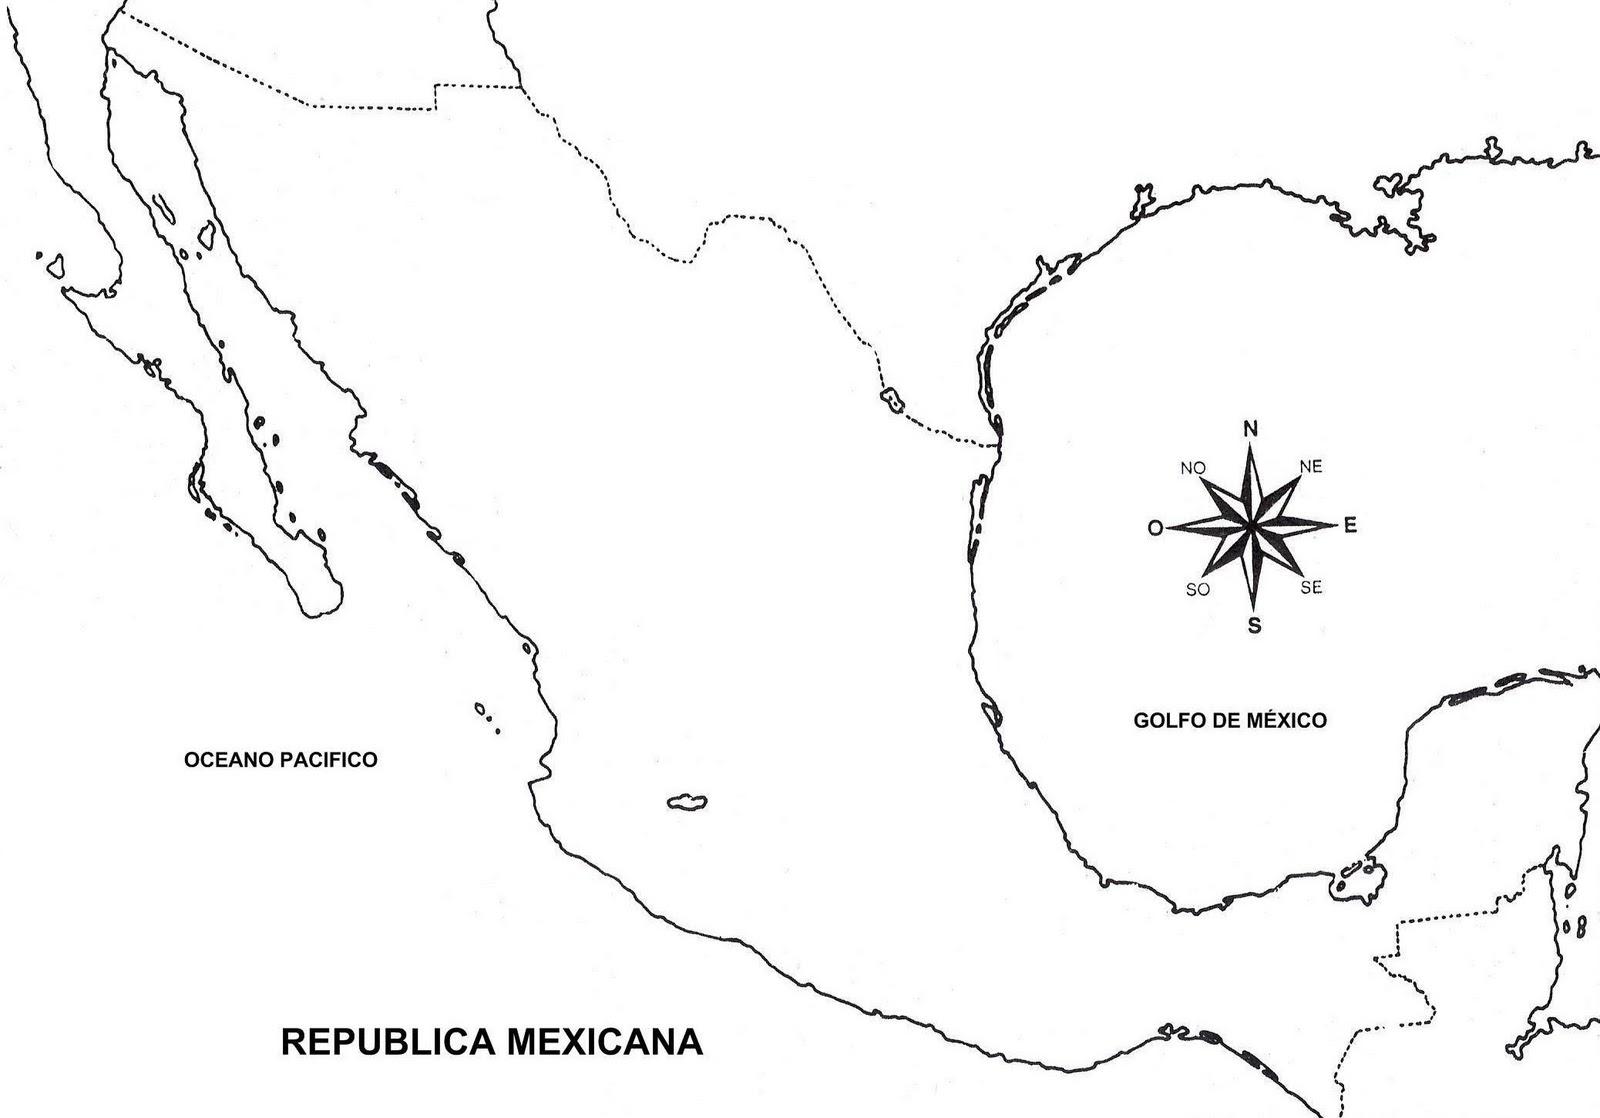 PZ C: mapa de mexico